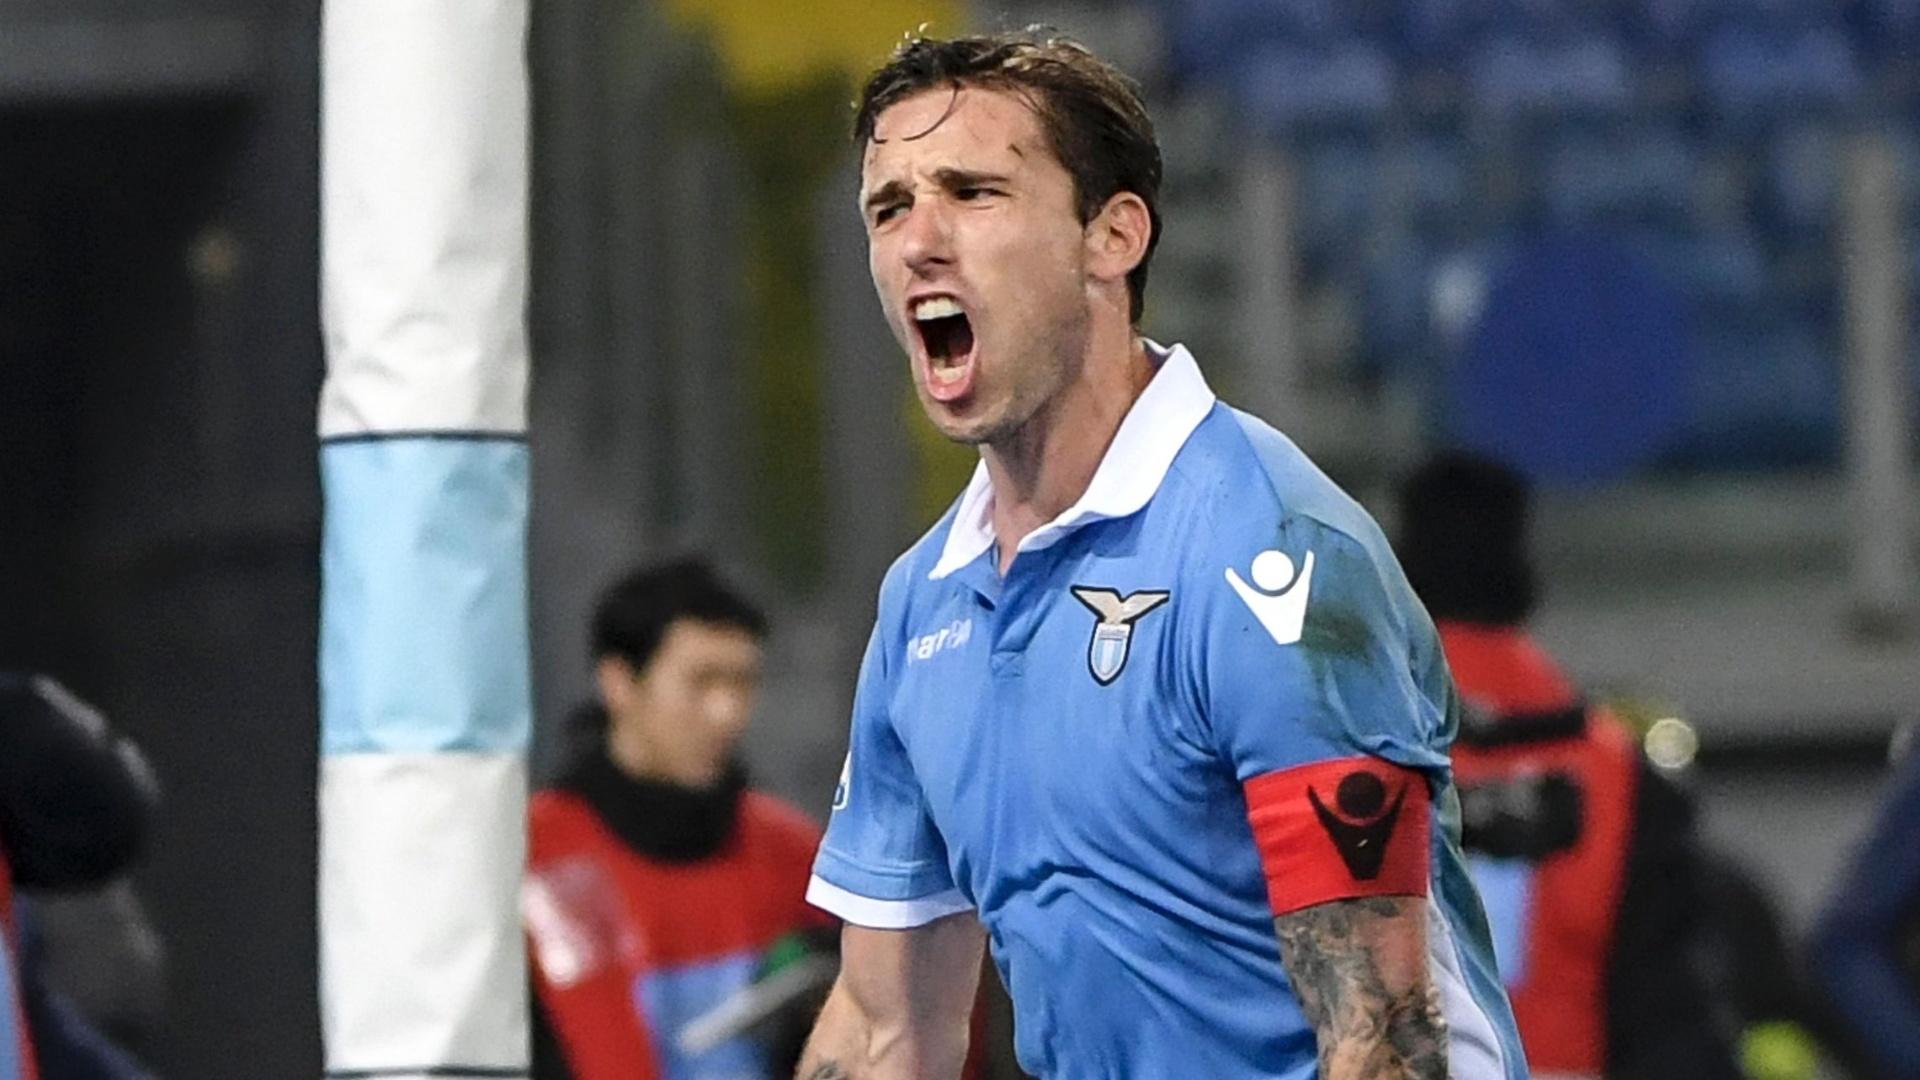 Lucas Biglia comemora o gol da Lazio contra o Milan